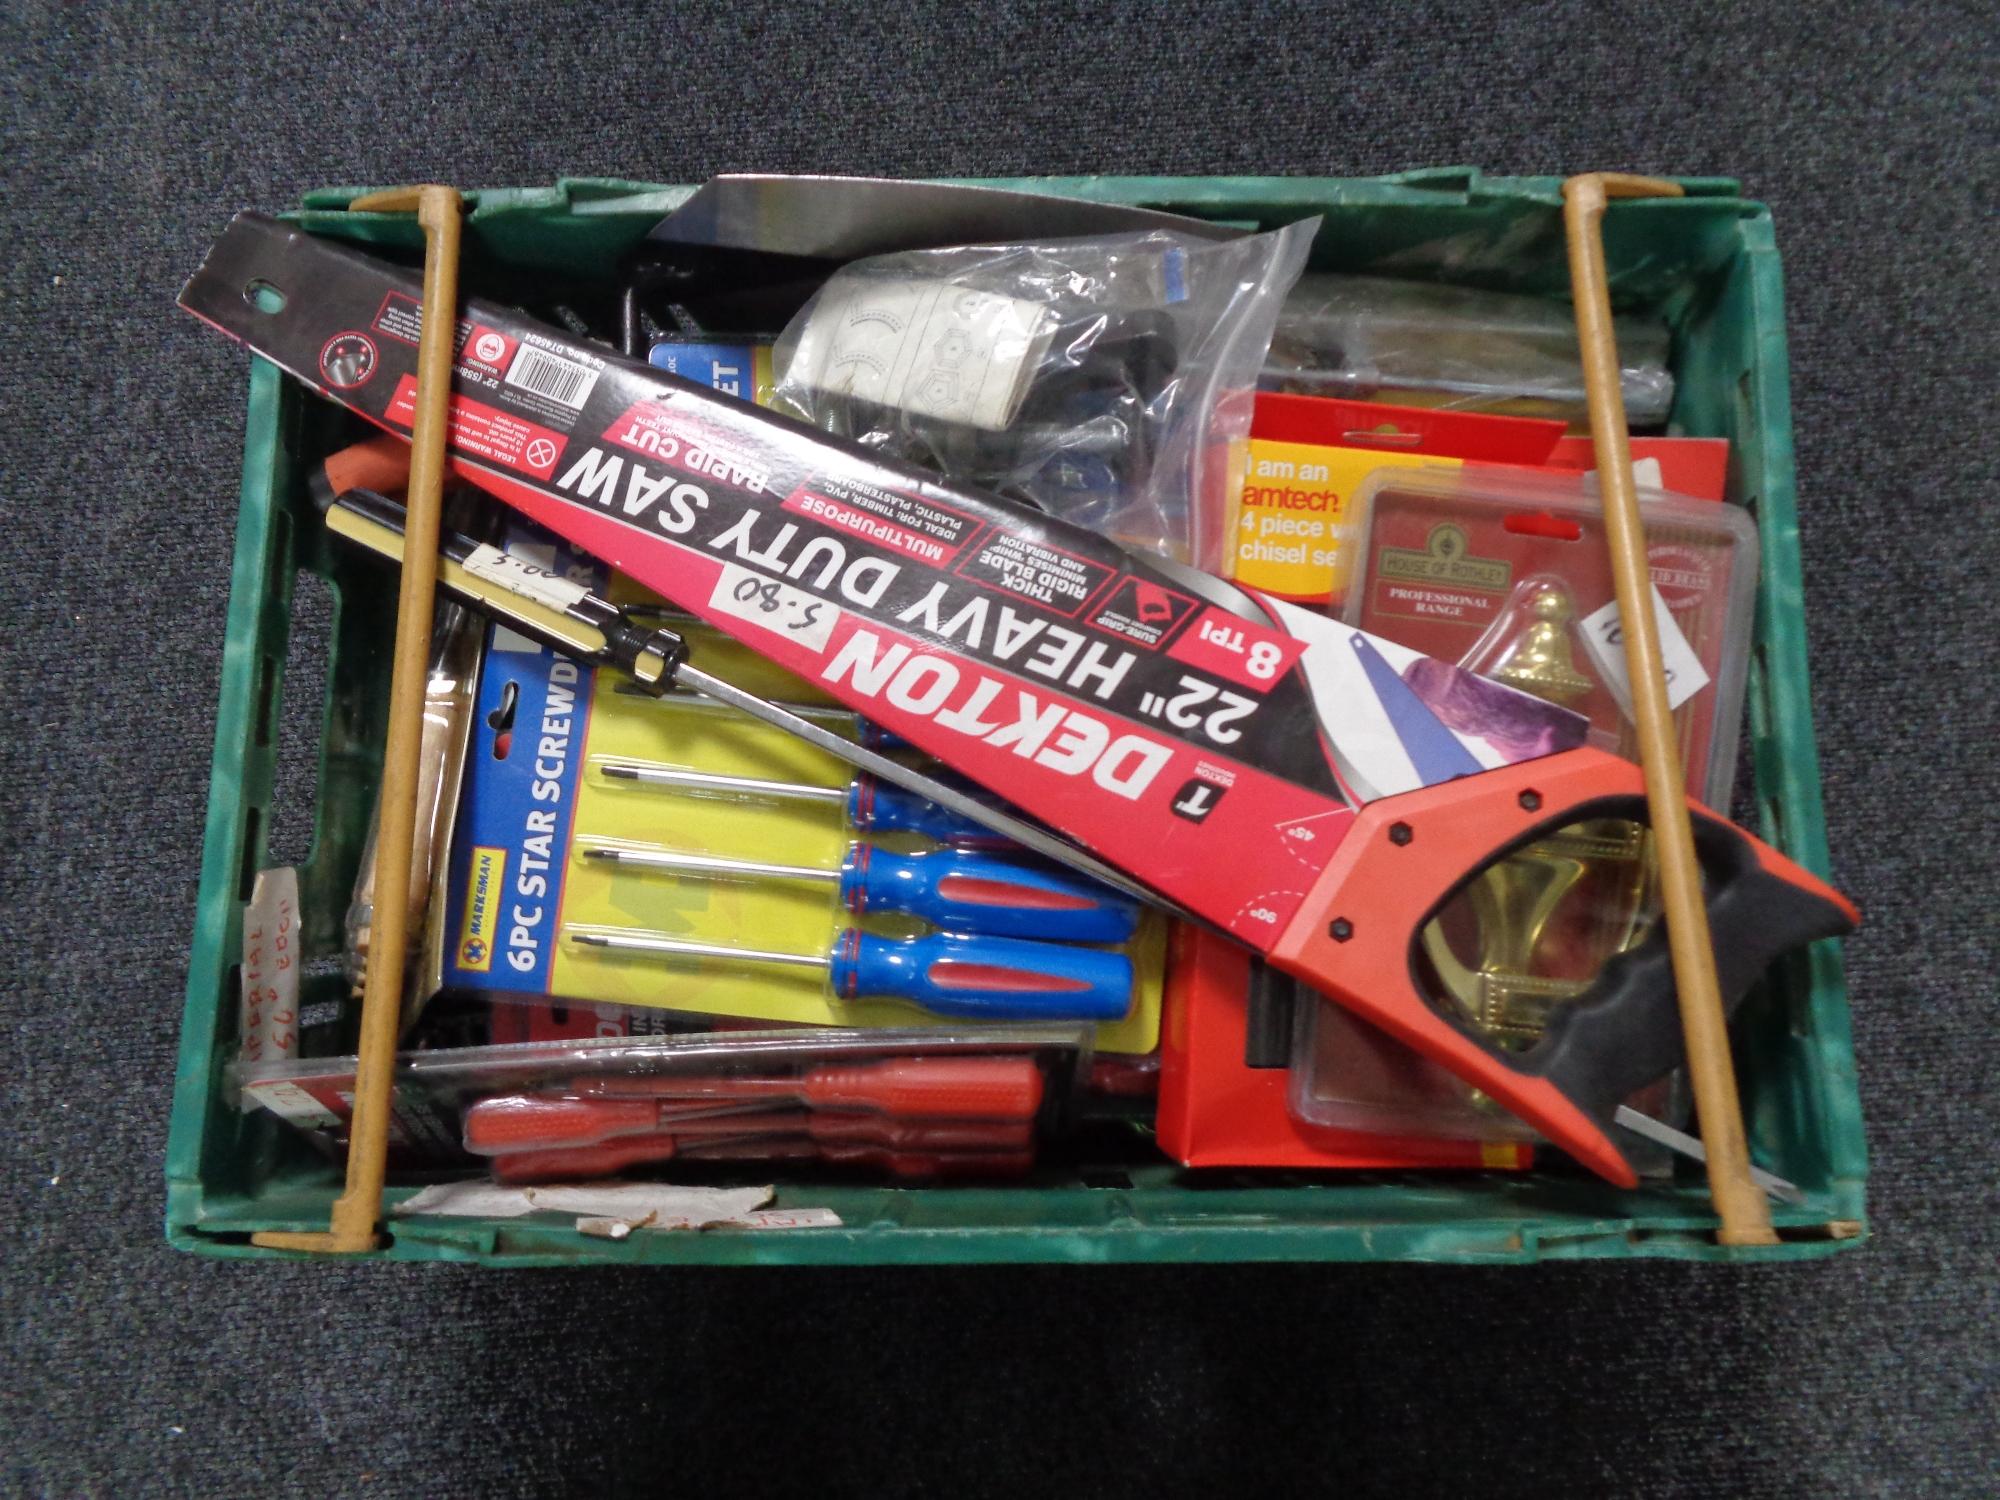 A crate of new tools, screw driver set, hand saw, brass door knocker,